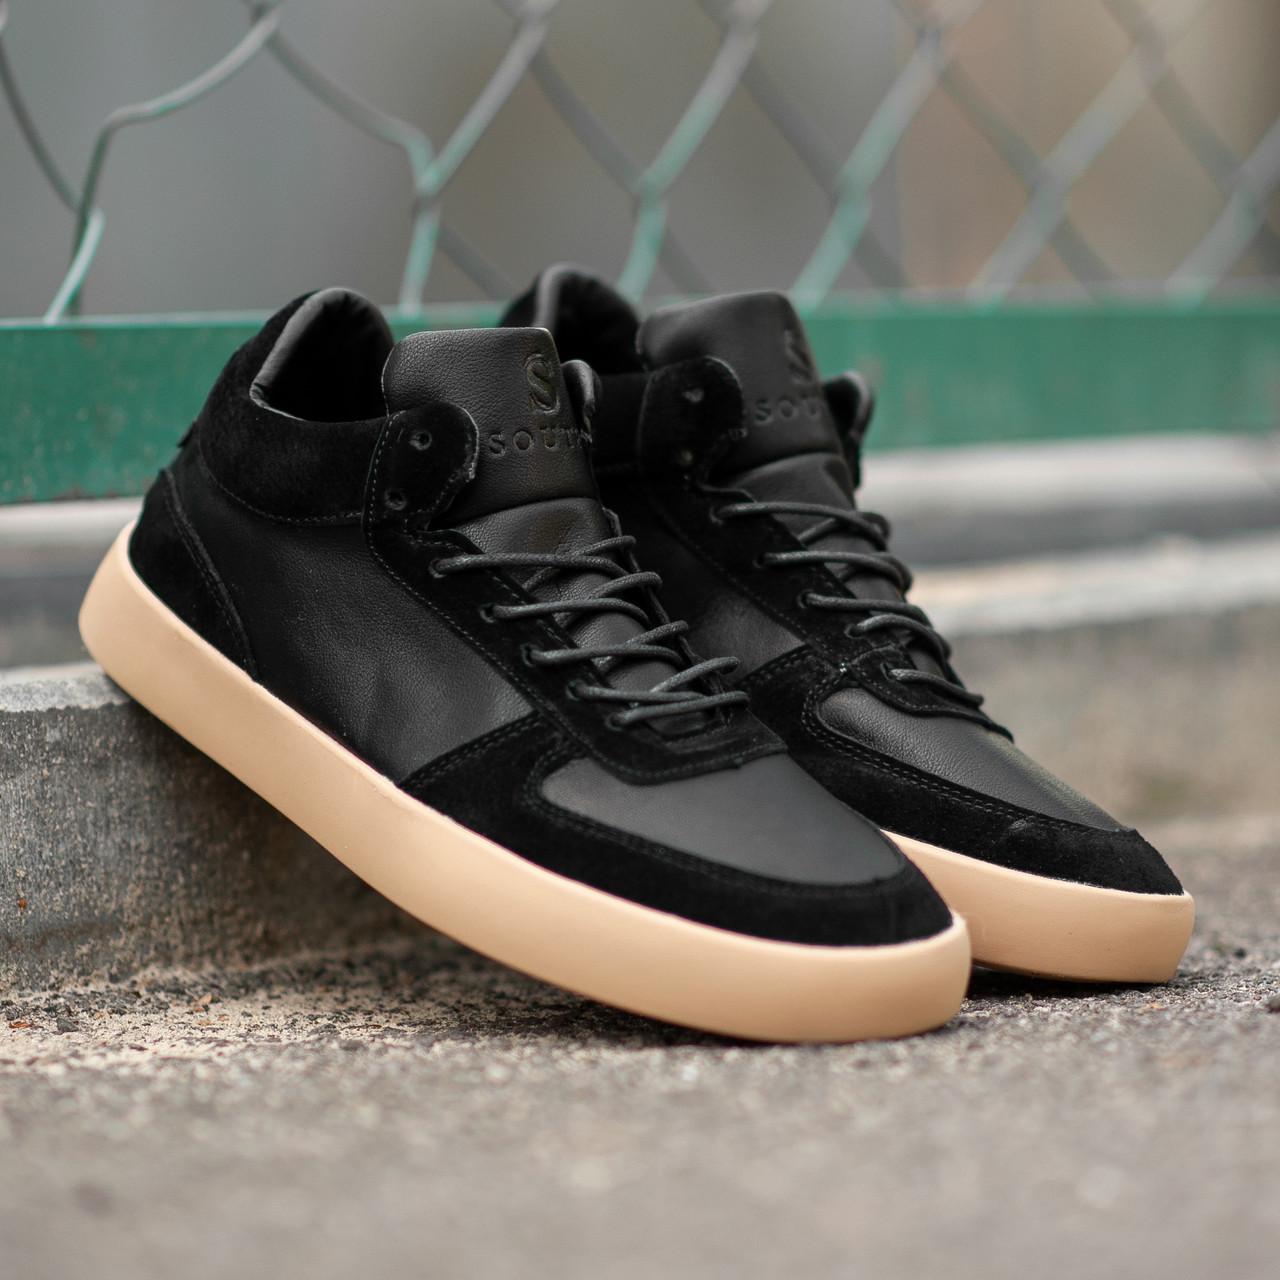 Мужские кроссовки South Wild black. Натуральная замша, кожа